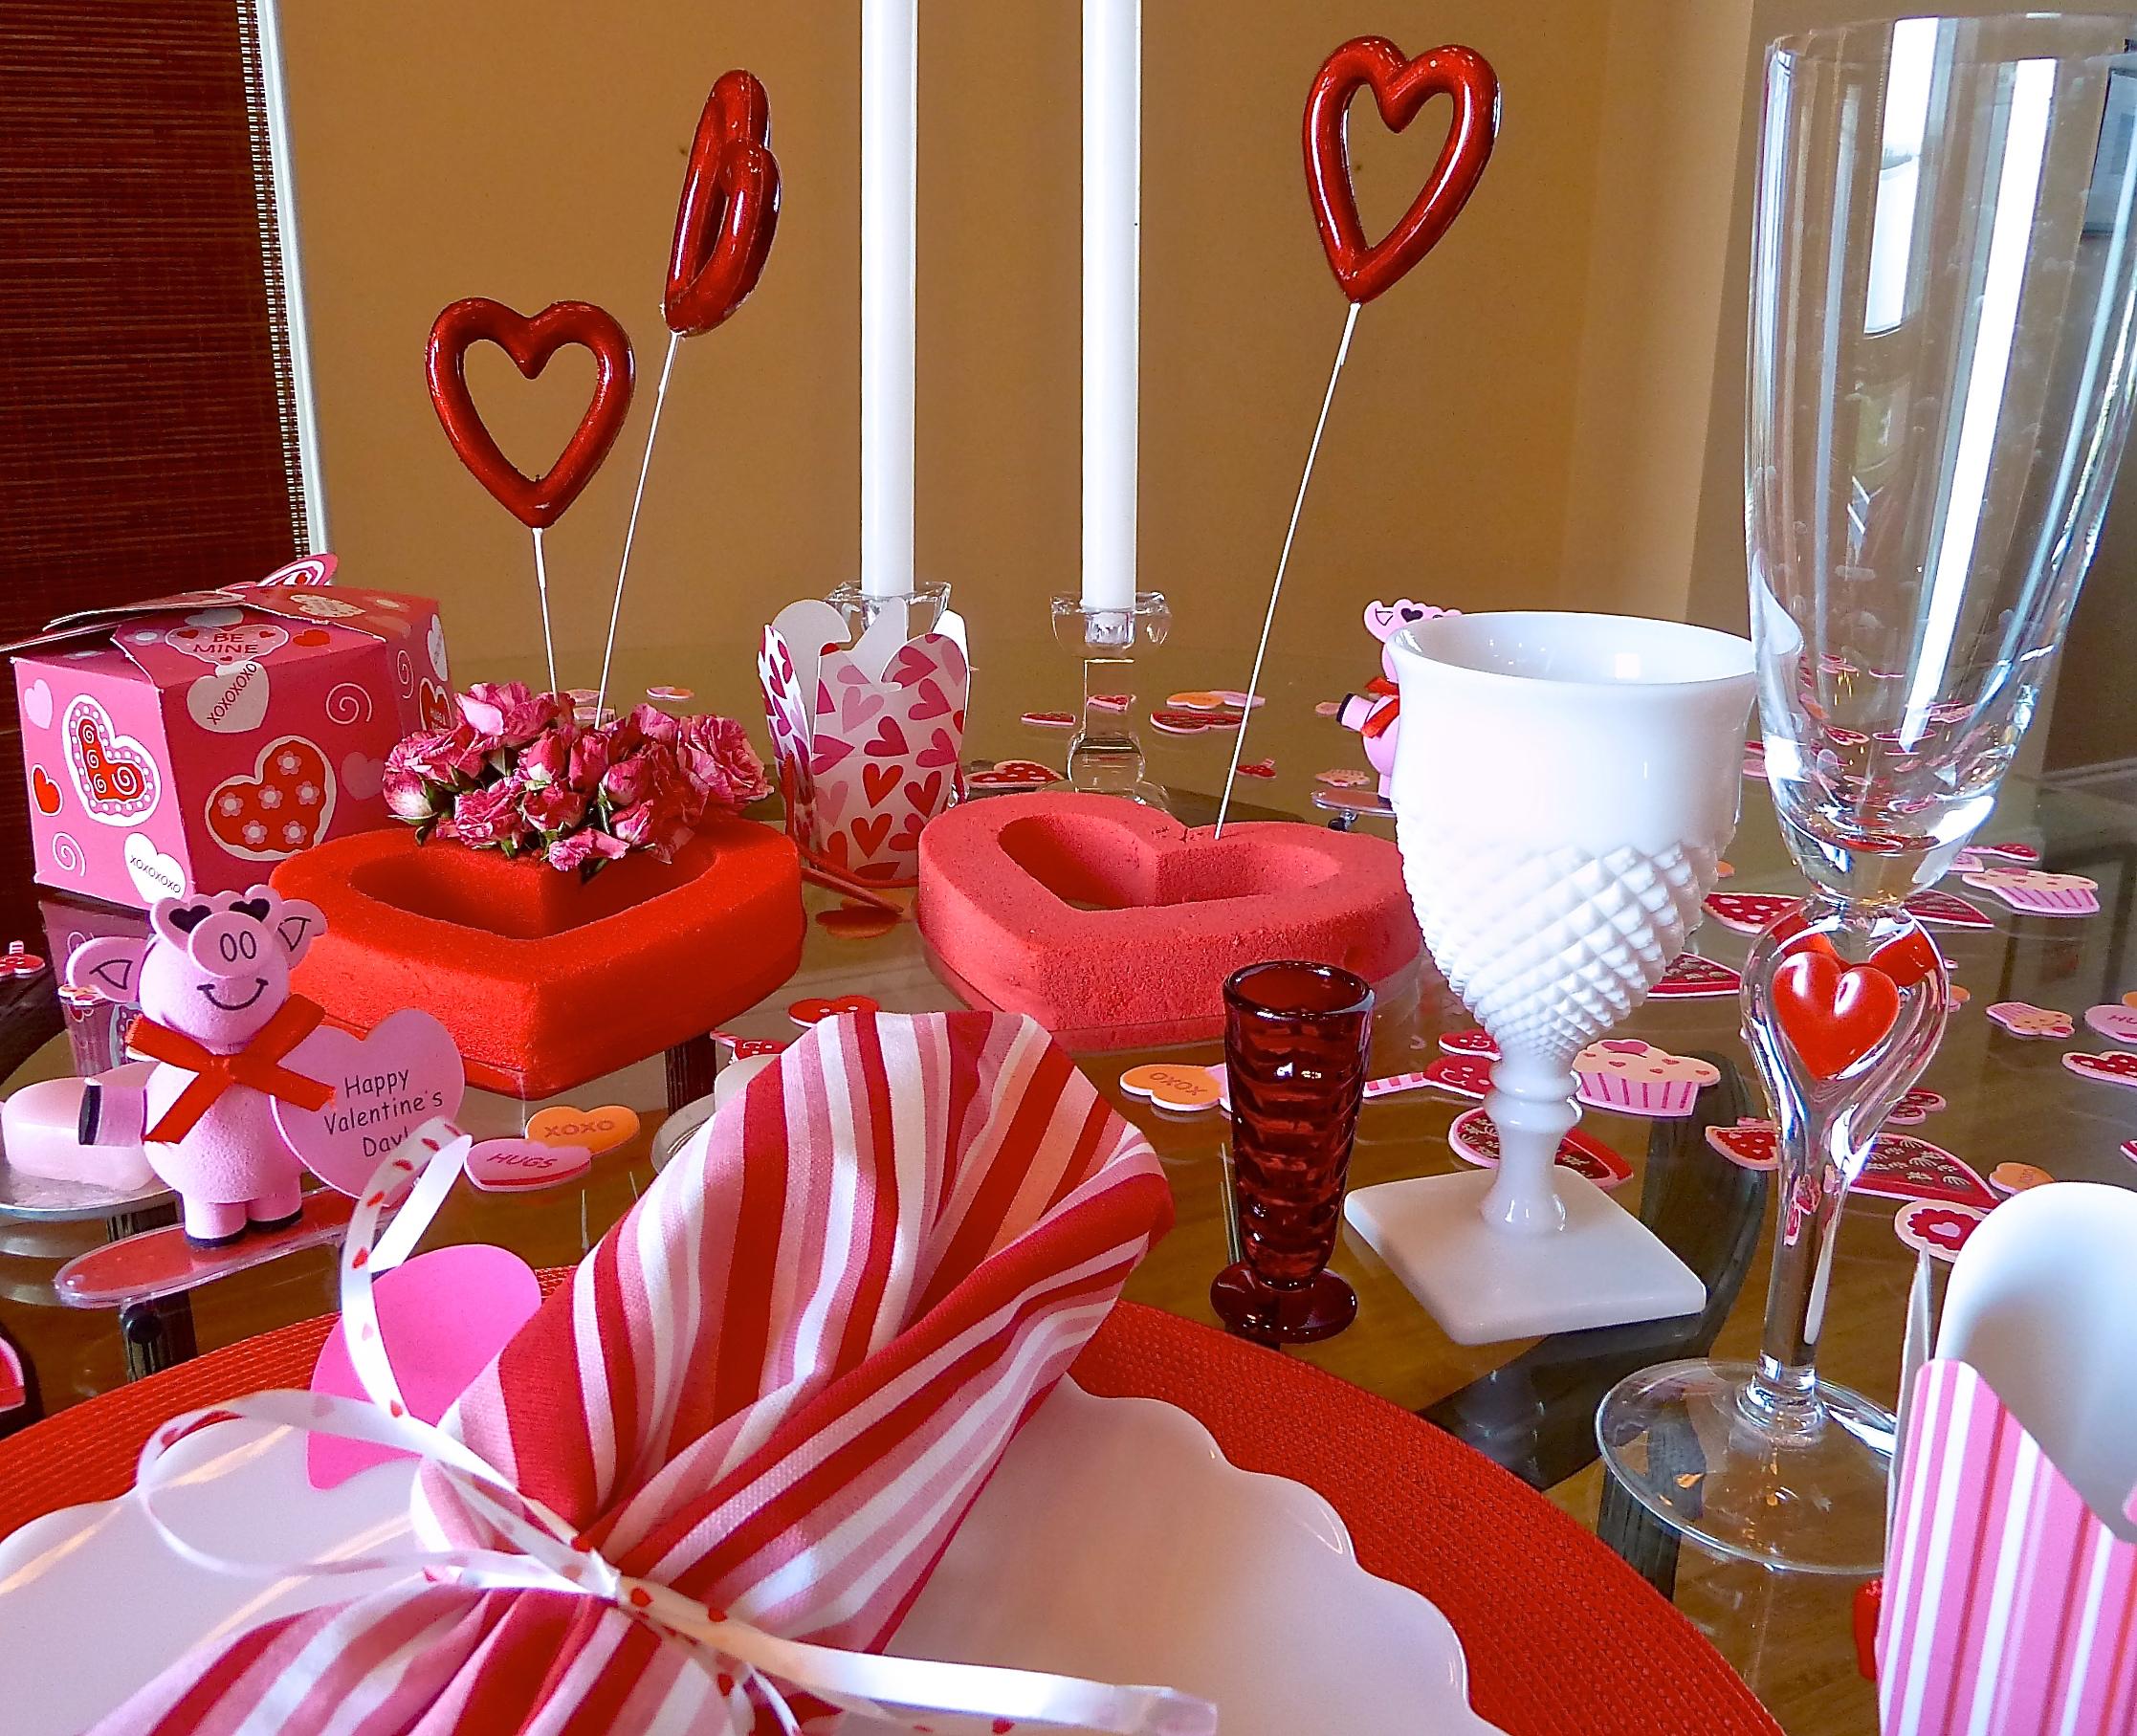 cindi__Valentine_tabletop_spiritedtable_photo1.jpg